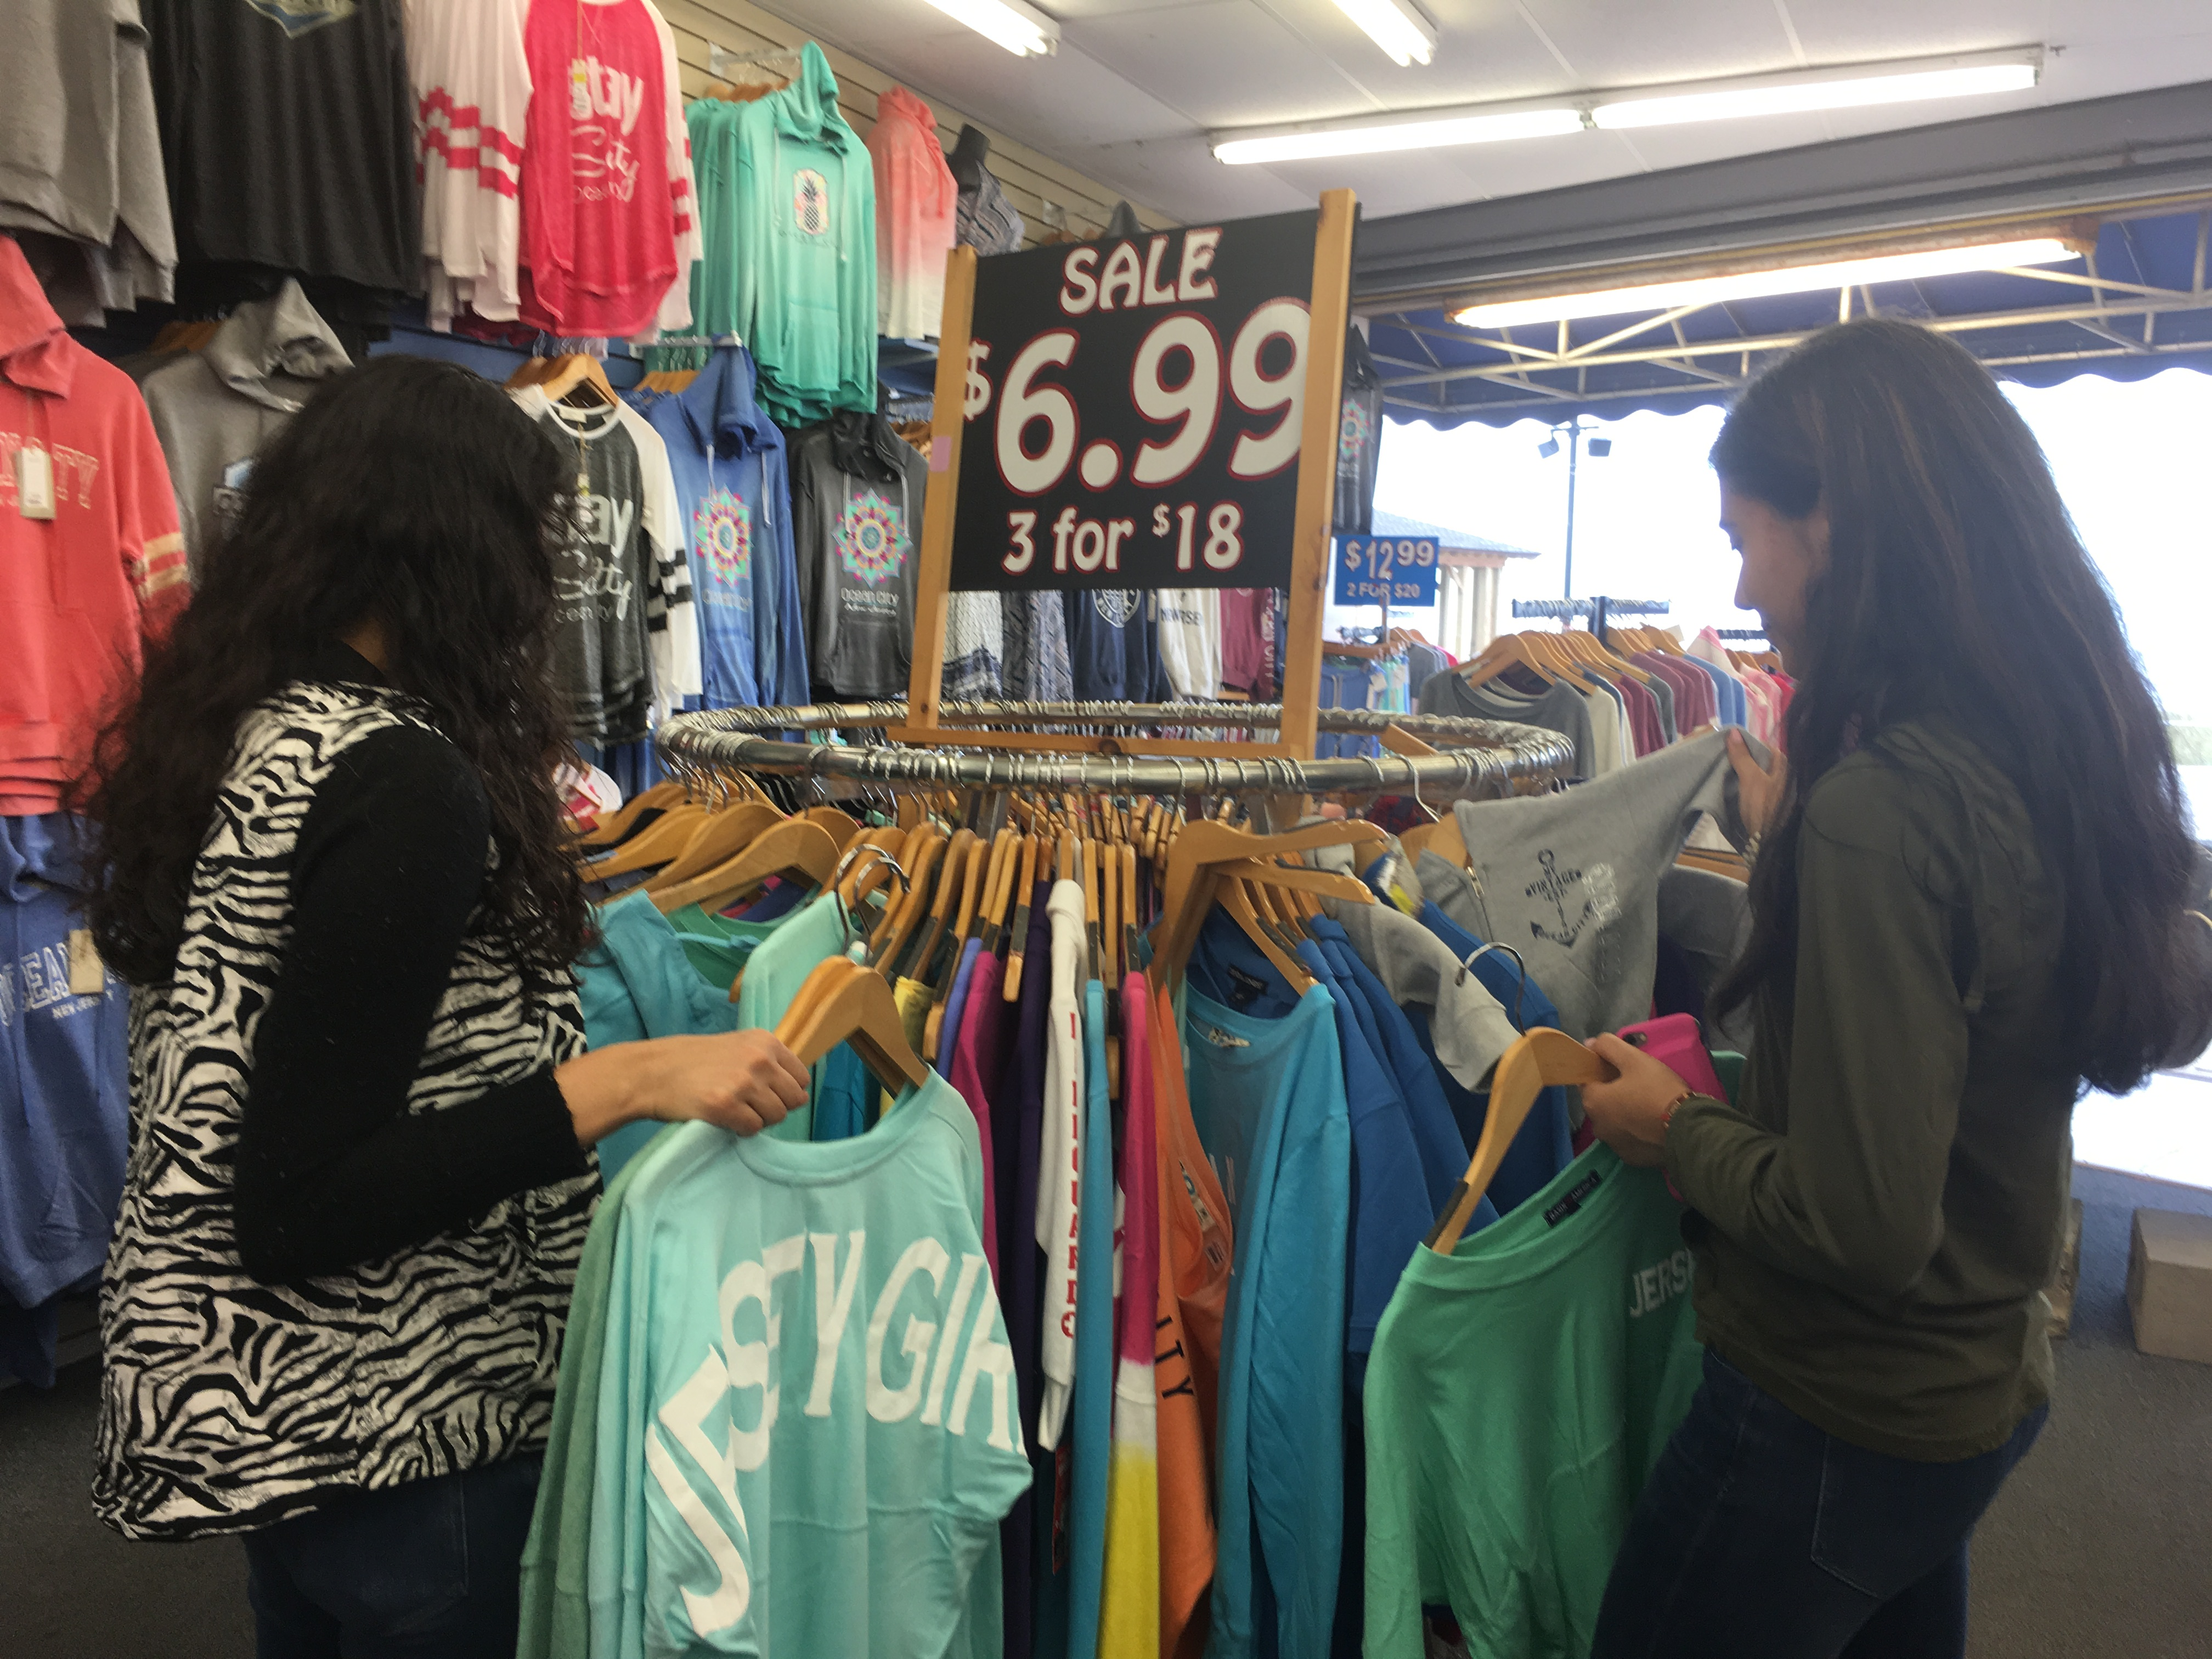 "Bargain hunters, like cousins Meg and Nina Patel of Atlantic County, leaf through sweatshirts that were ""3 for $18"" or $6.99 each, last weekend on the Ocean City boardwalk."